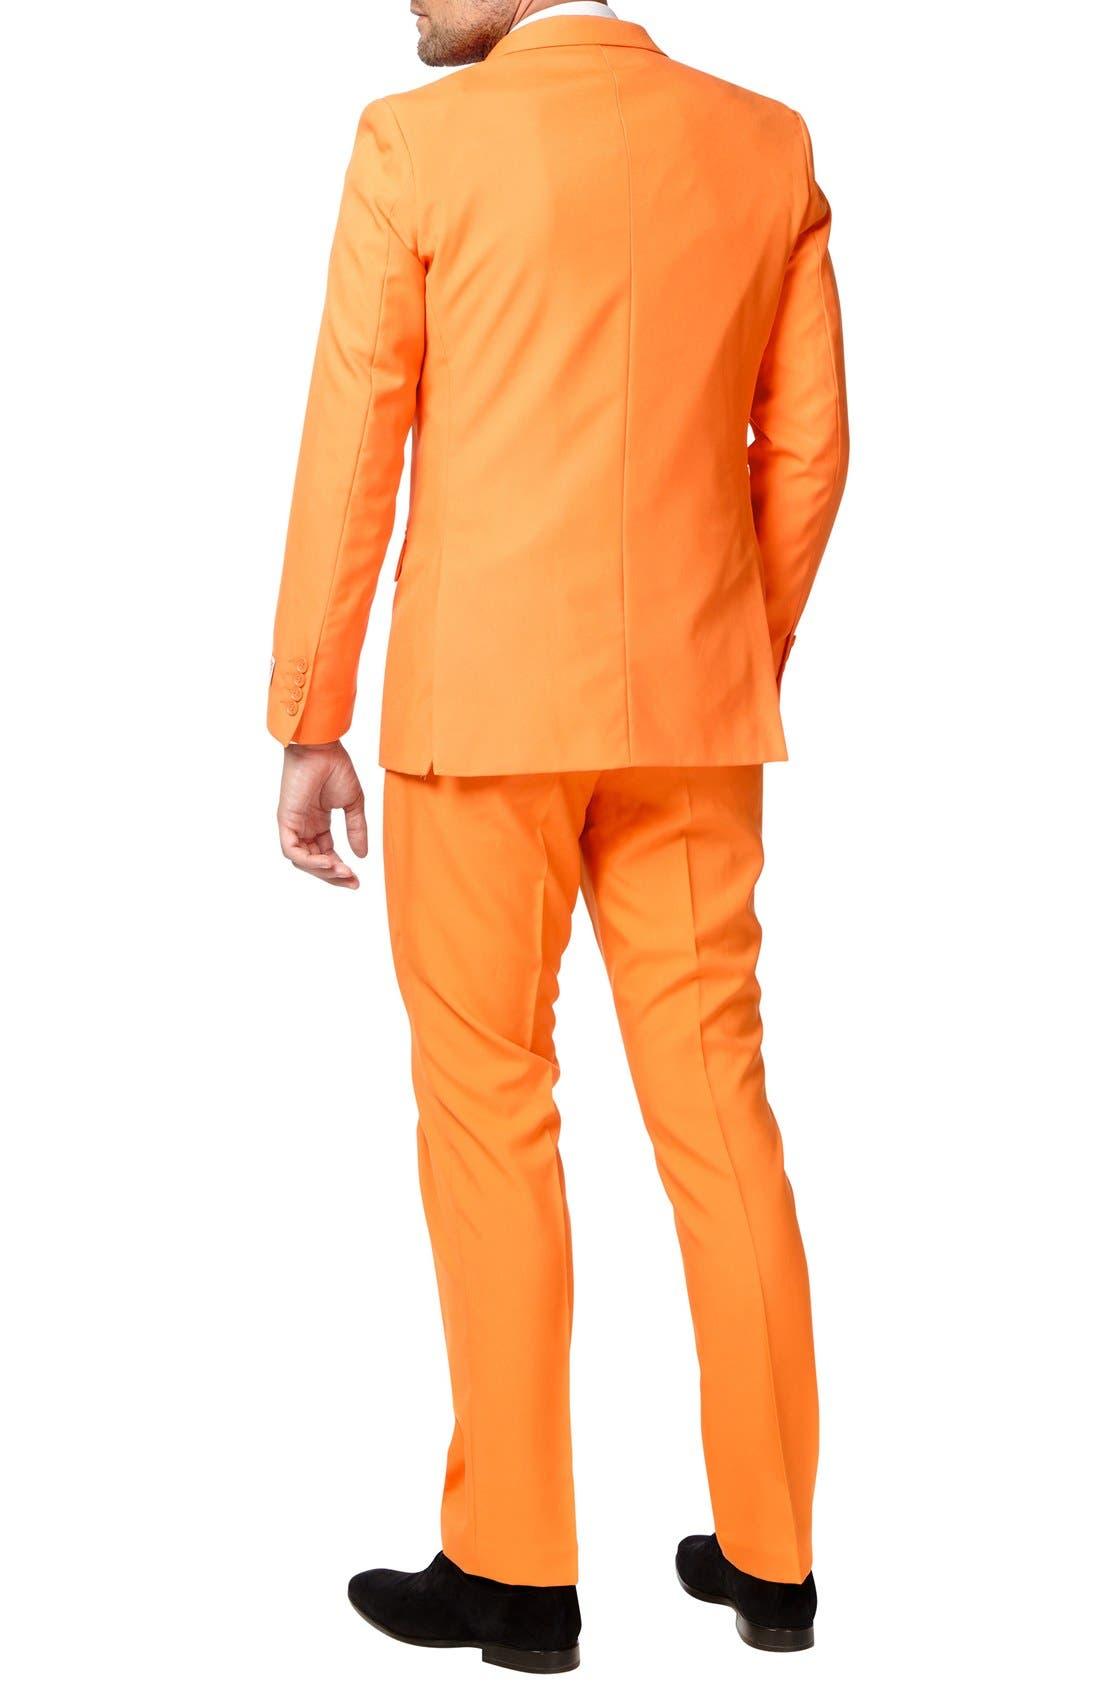 'The Orange' Trim Fit Two-Piece Suit with Tie,                             Alternate thumbnail 2, color,